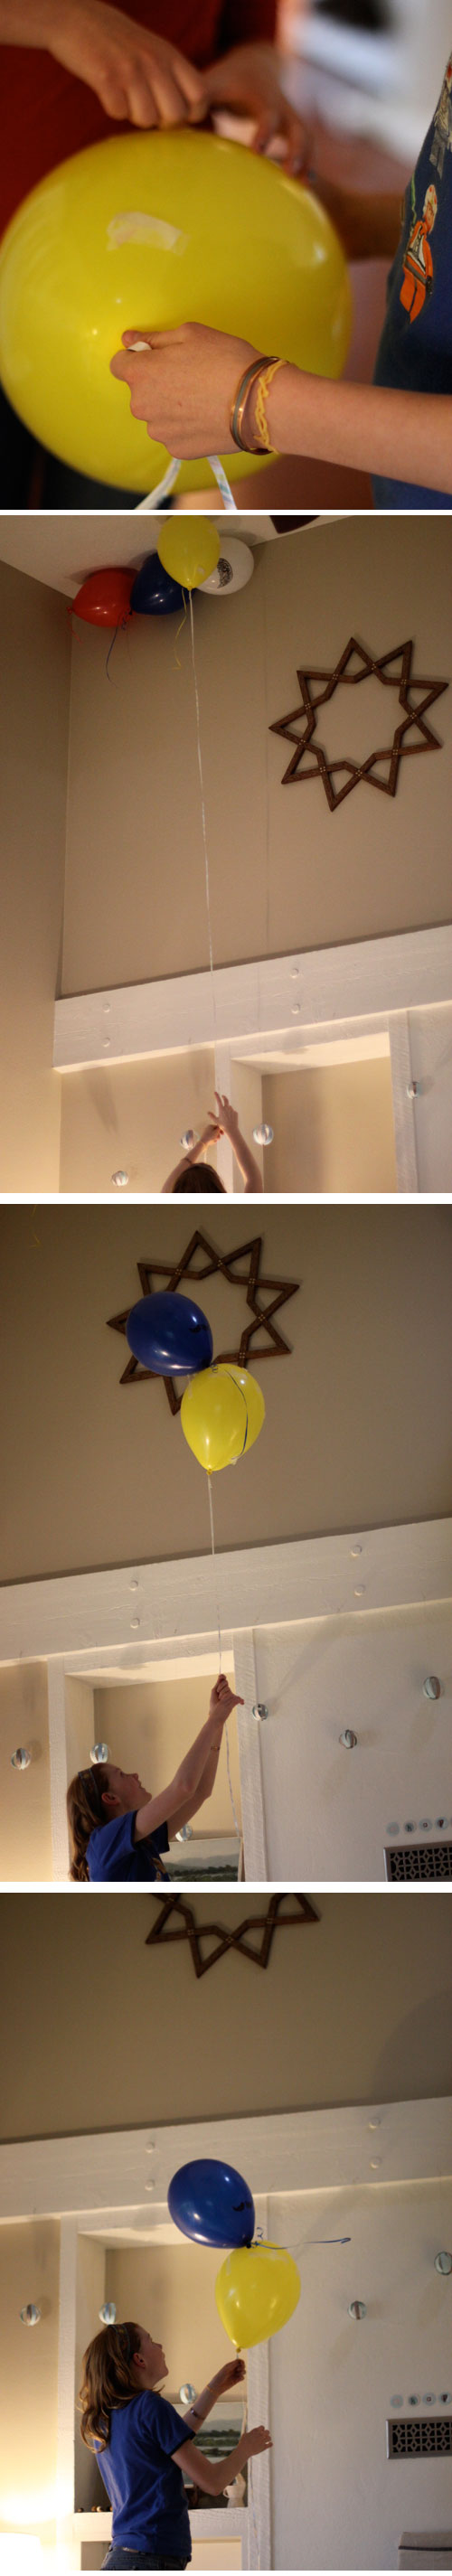 Balloonfishing